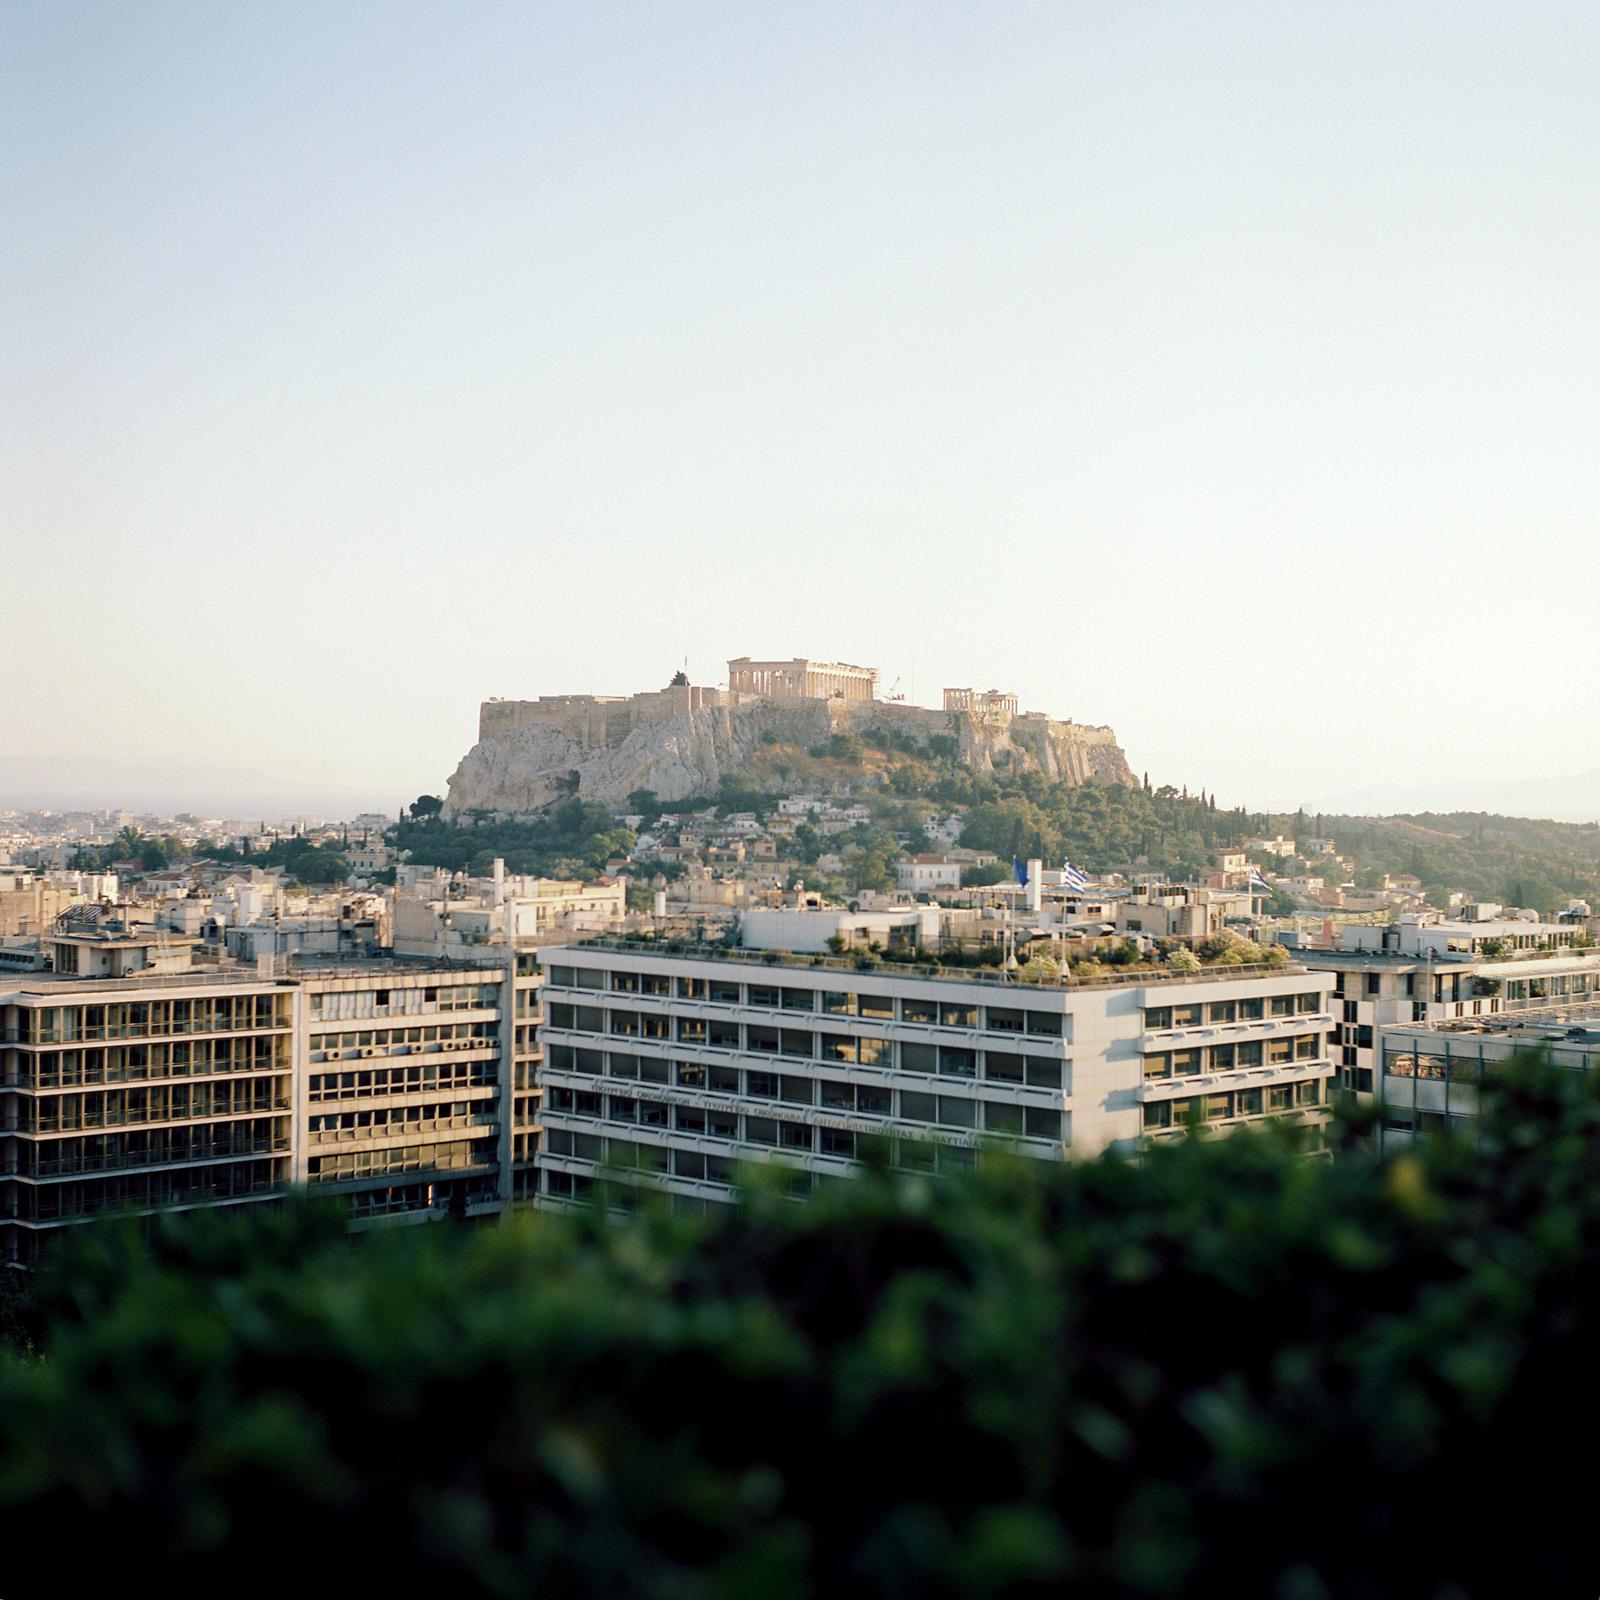 Greece_Parthenon_Yashicamat124g_05.jpg